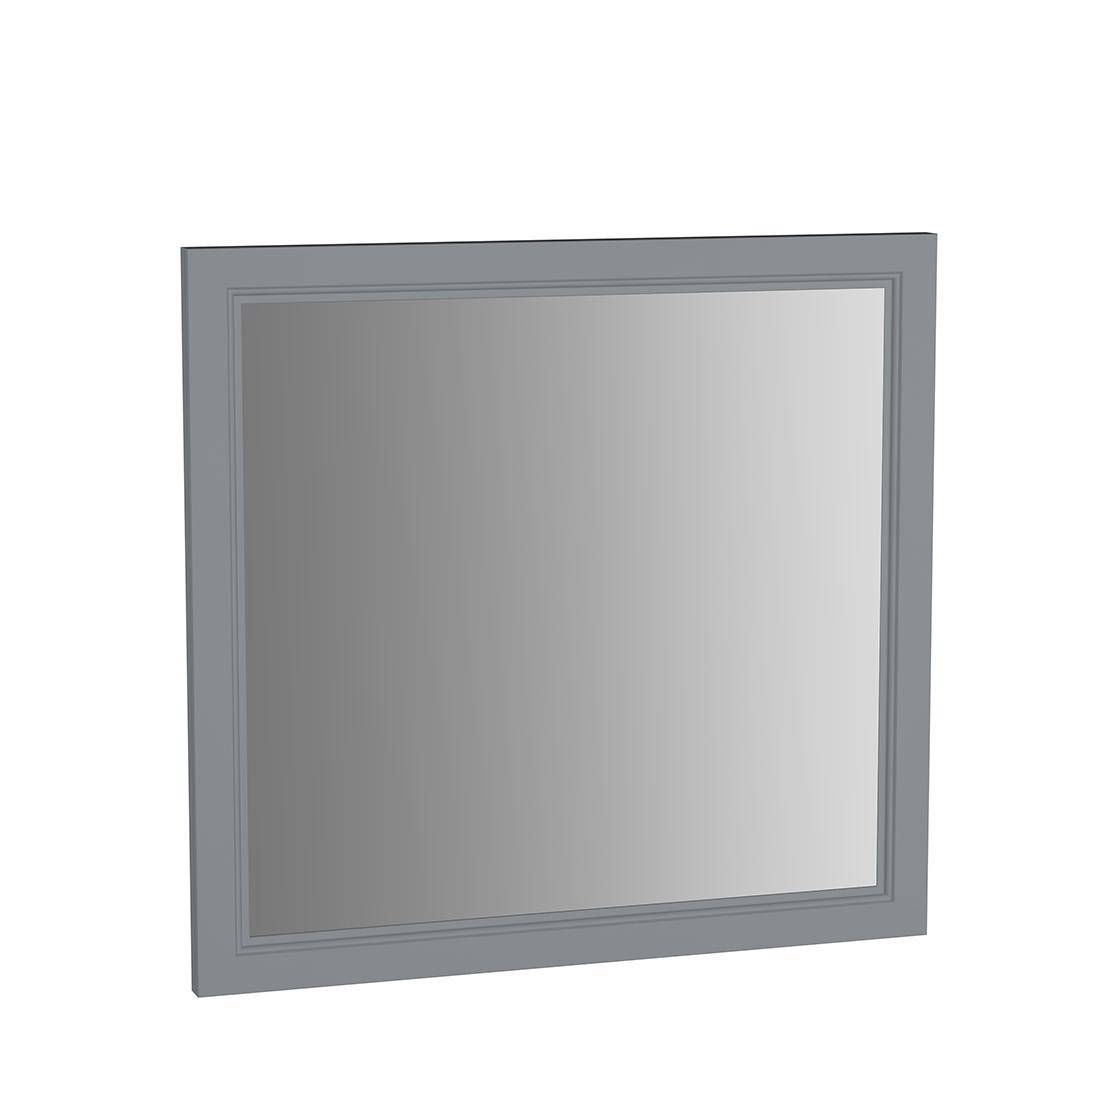 Valarte miroir, 80 cm, gris mat